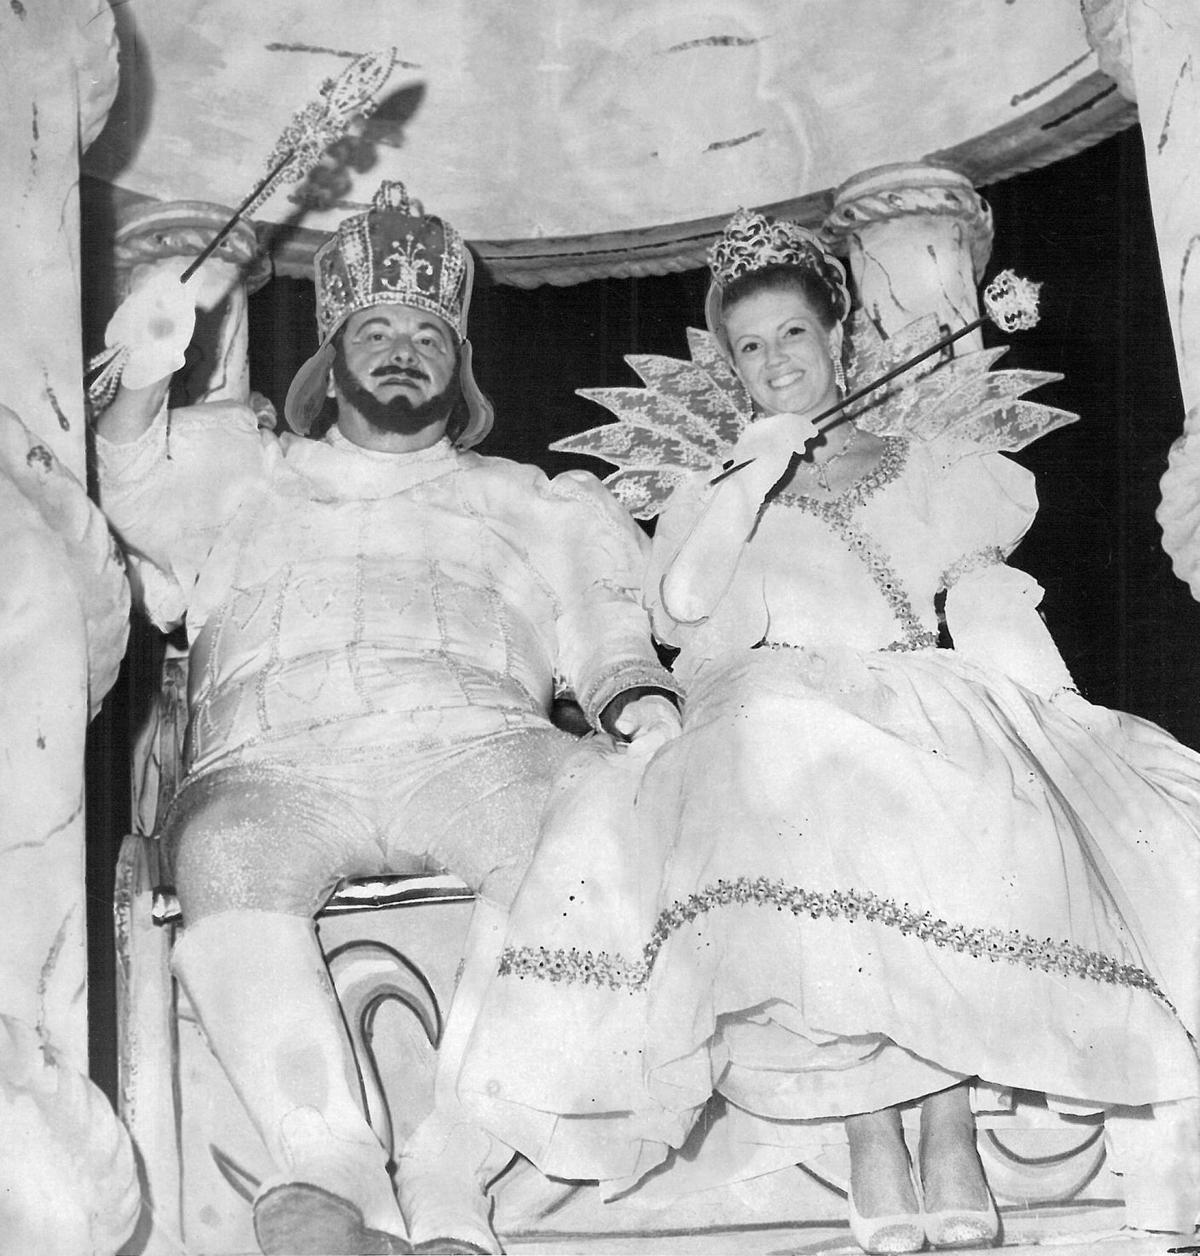 Vintage Mardi Gras photos of parades that no longer roll: #ThrowBackThursday